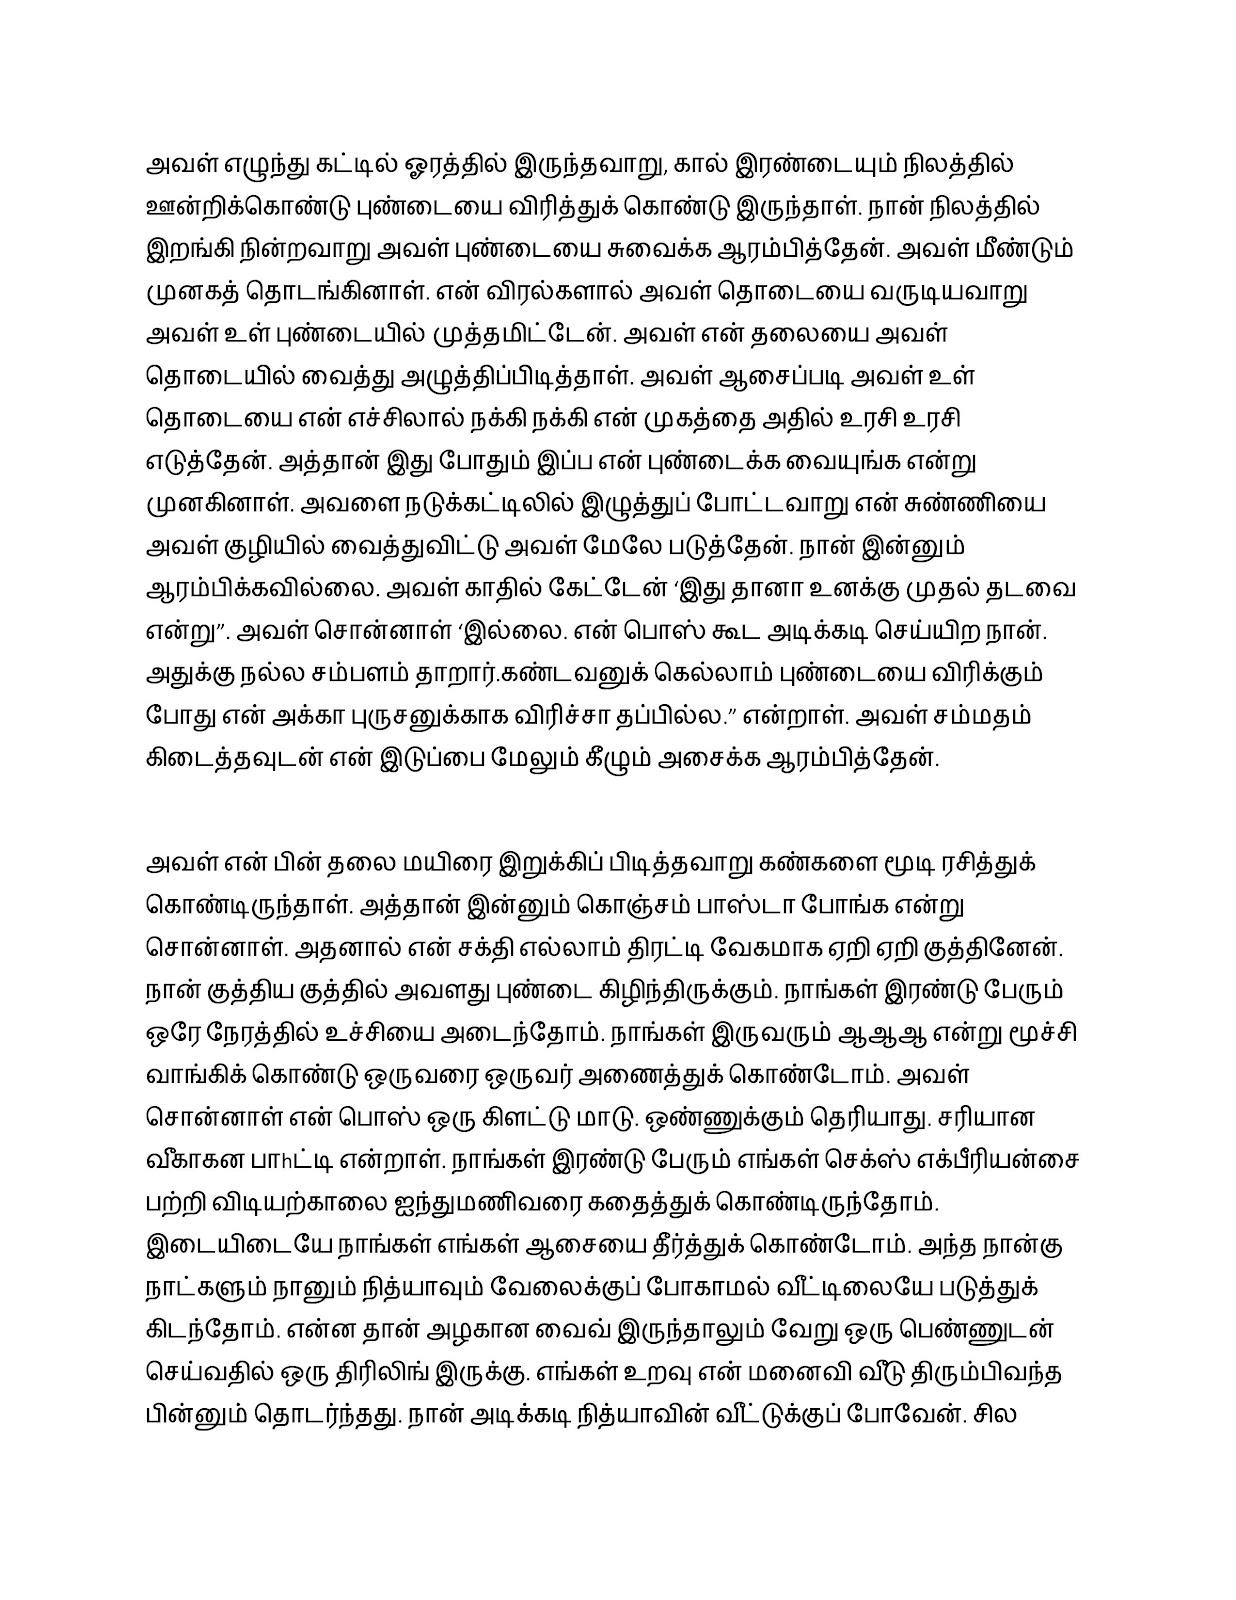 tamil kamakathaikal kalla uravu nanbanin manaivi in tamil